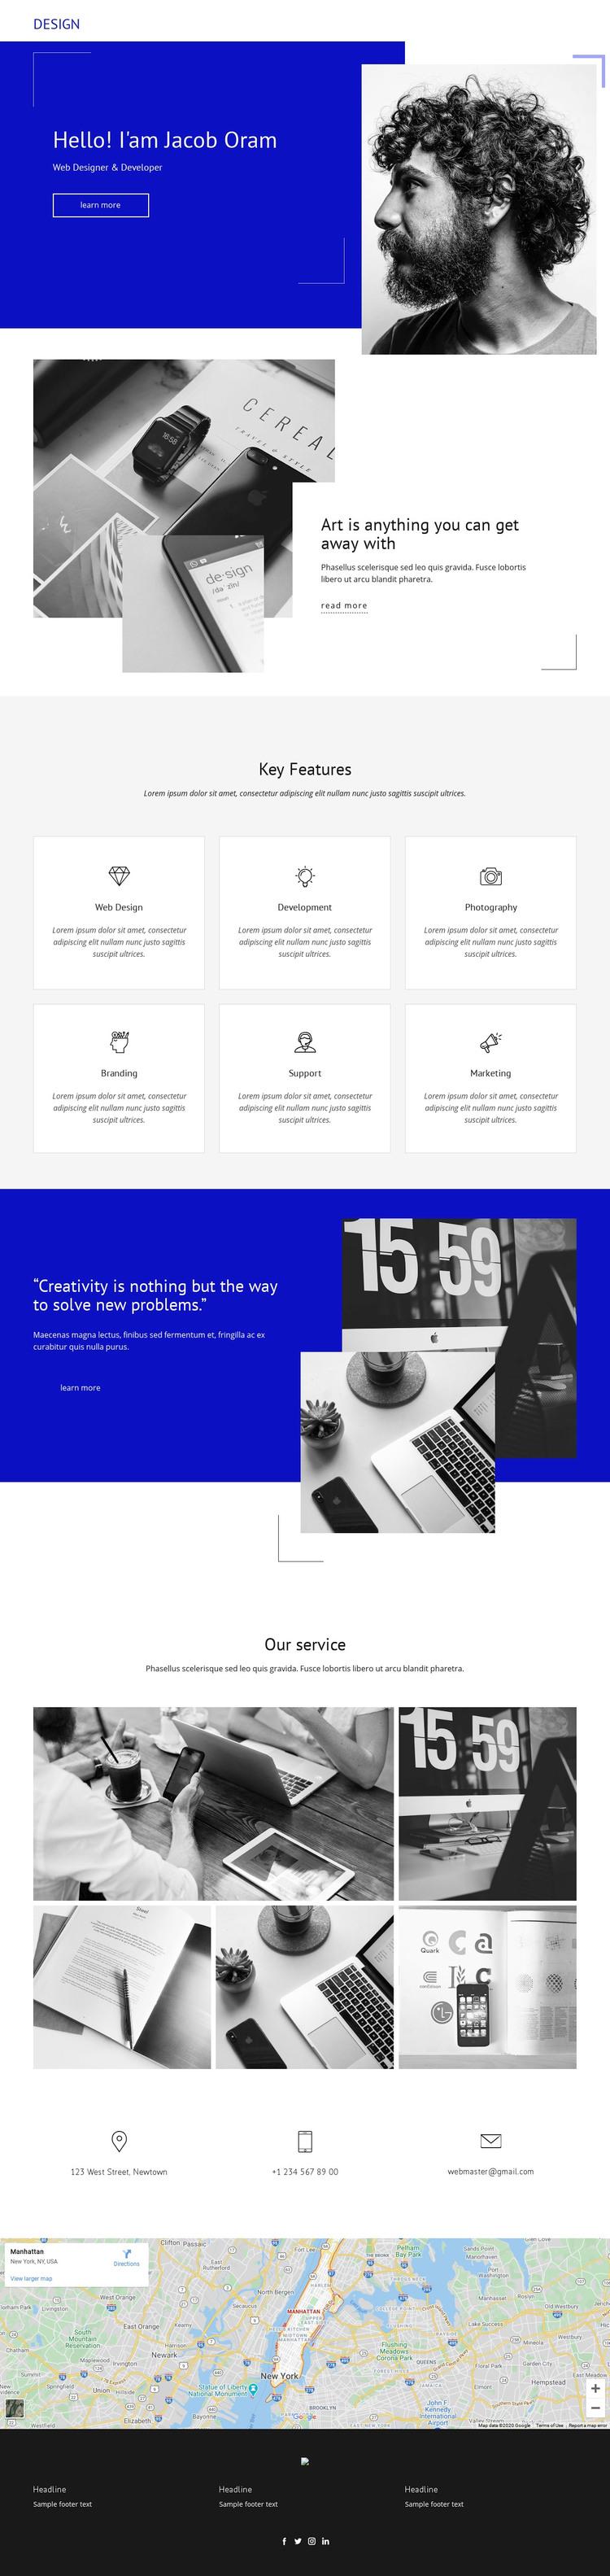 Jacob Oram Portfolio WordPress Website